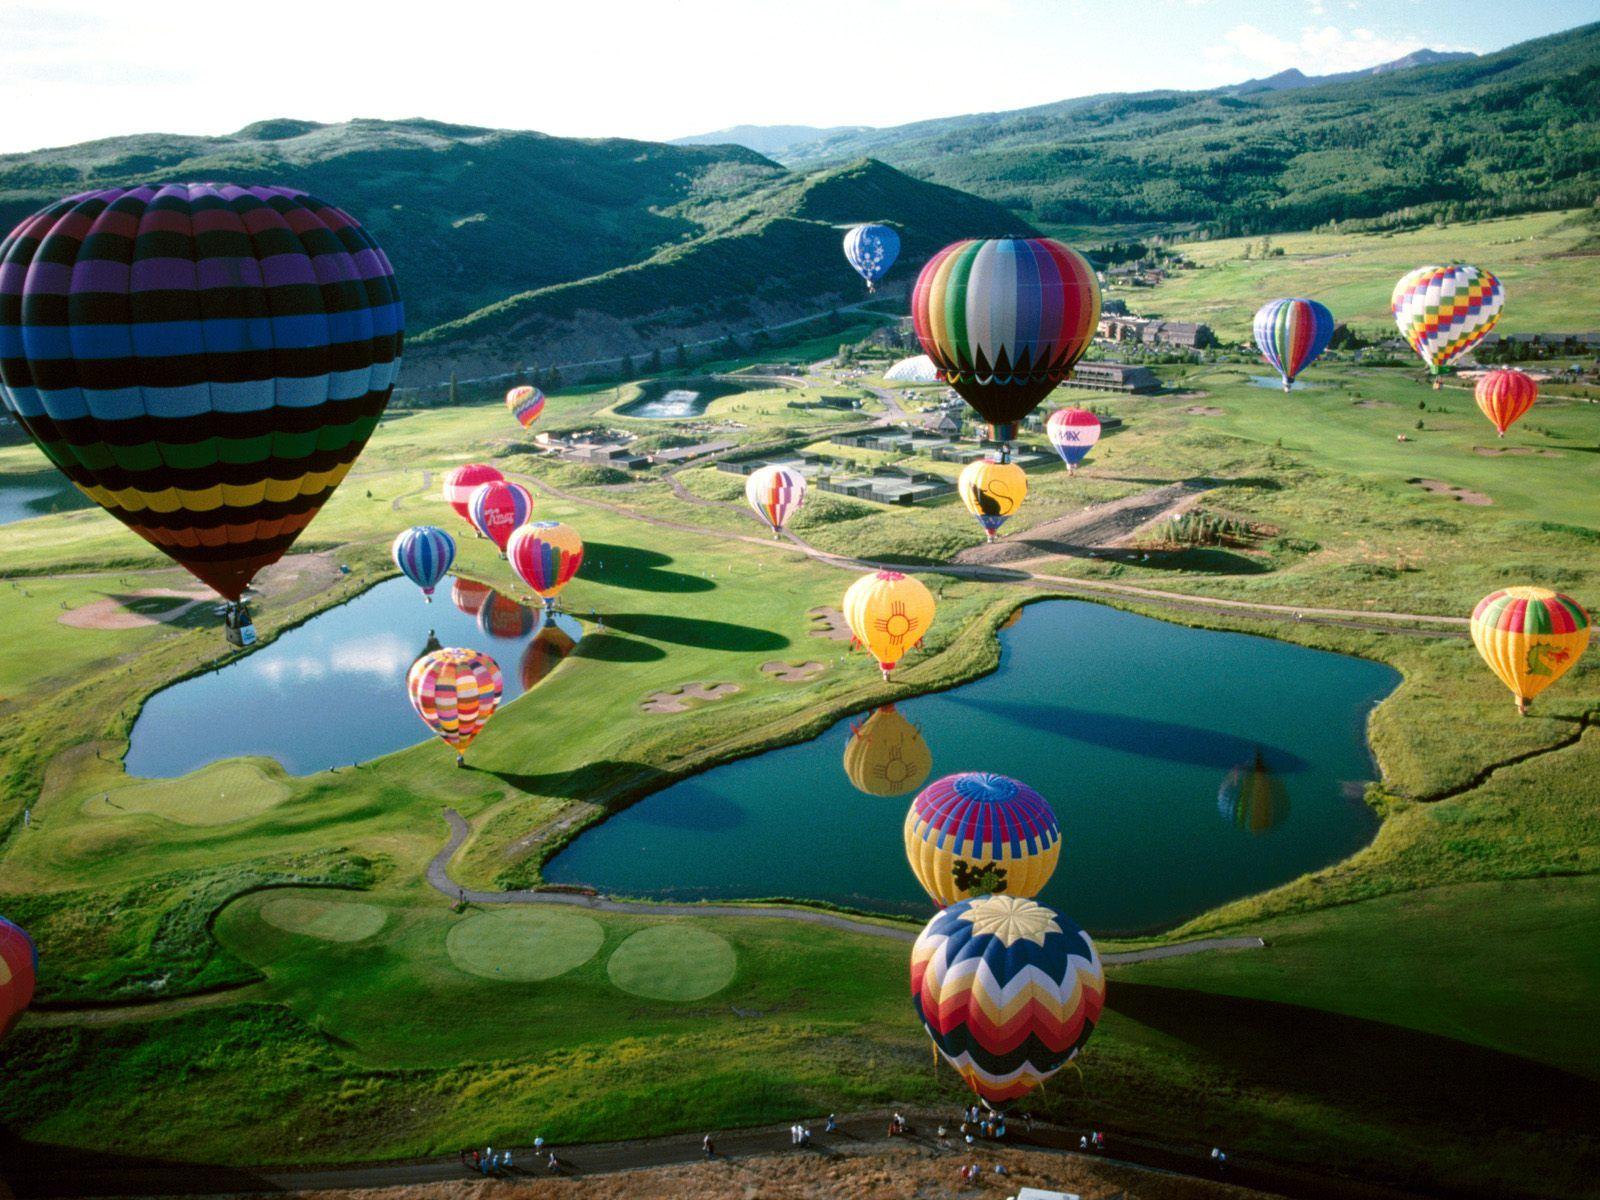 Millionaire Date Idea #5: Hot Air Balloon Ride